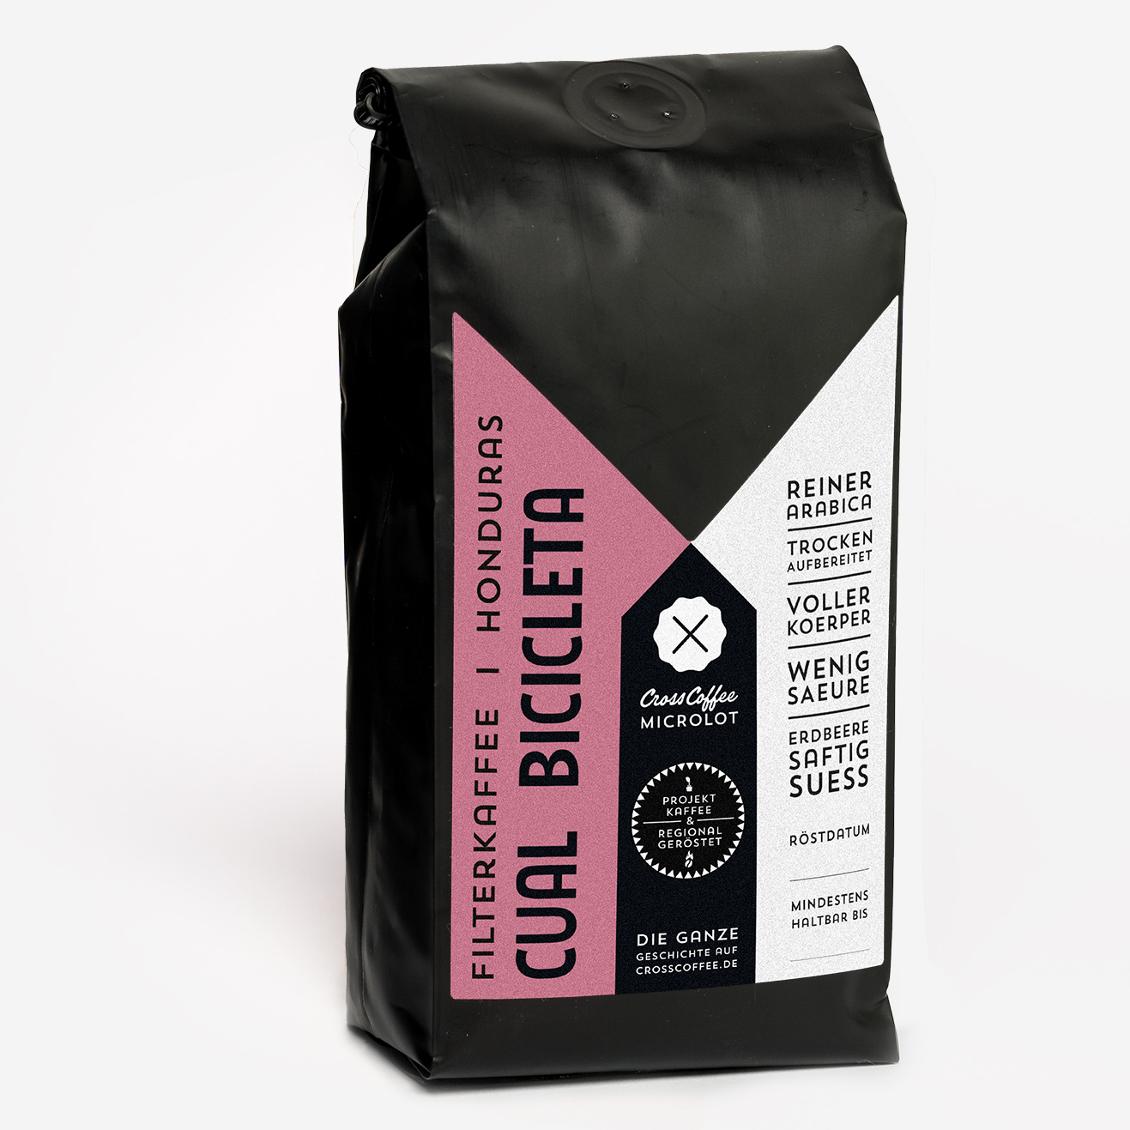 Produktbild Microlot CUAL BICICLETA Filterkaffee, Spezialitätenkaffee (specialty coffee)der Kaffeerösterei Cross Coffee aus Bremen